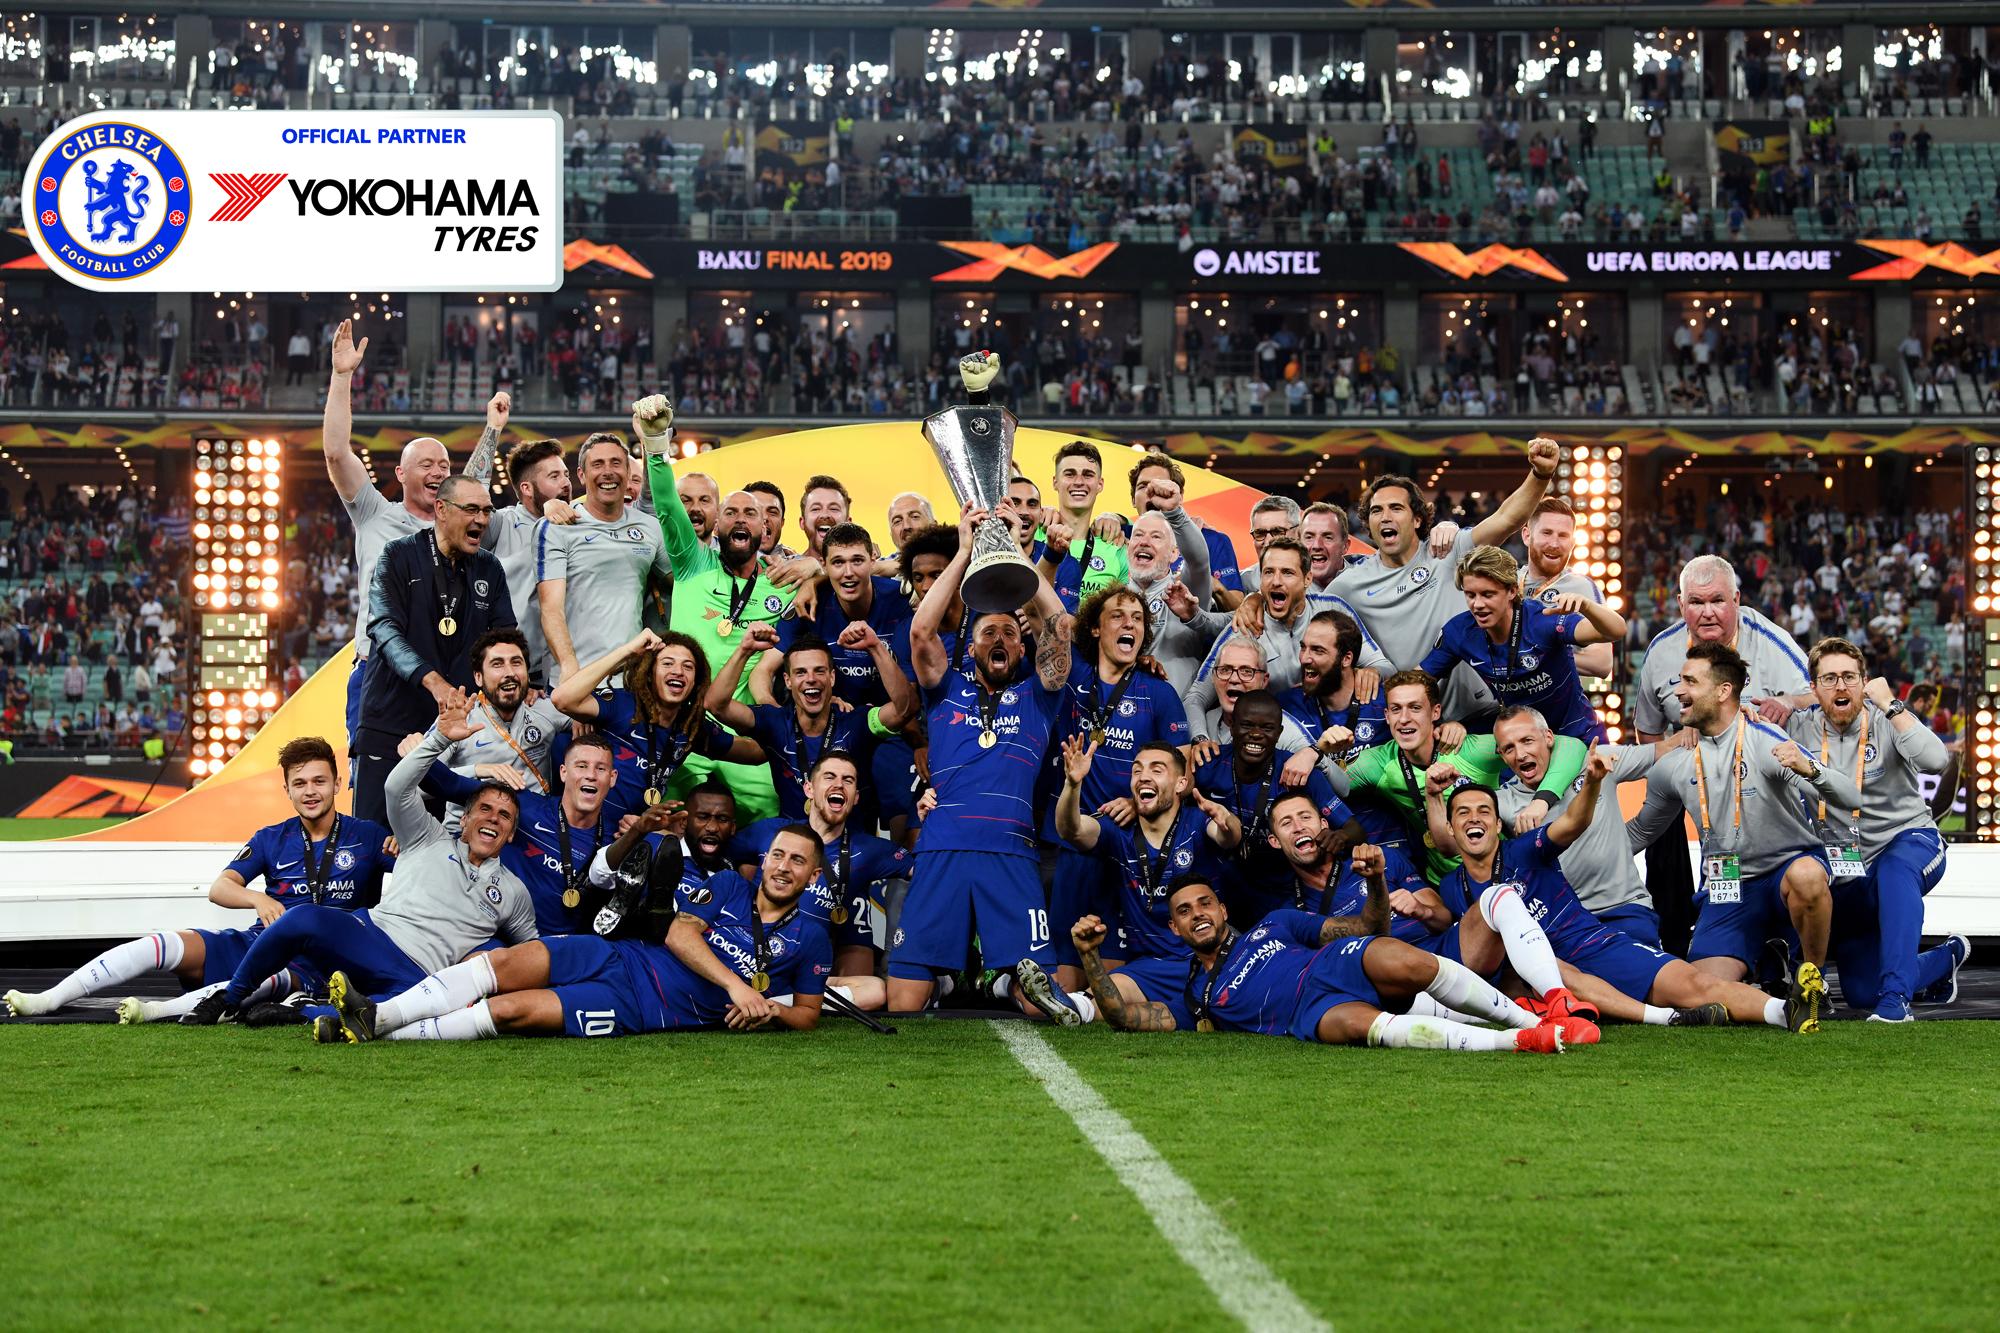 yokohama celebrates brand boost as chelsea wins europa league tyrepress https www tyrepress com 2019 05 yokohama celebrates brand boost as chelsea wins europa league